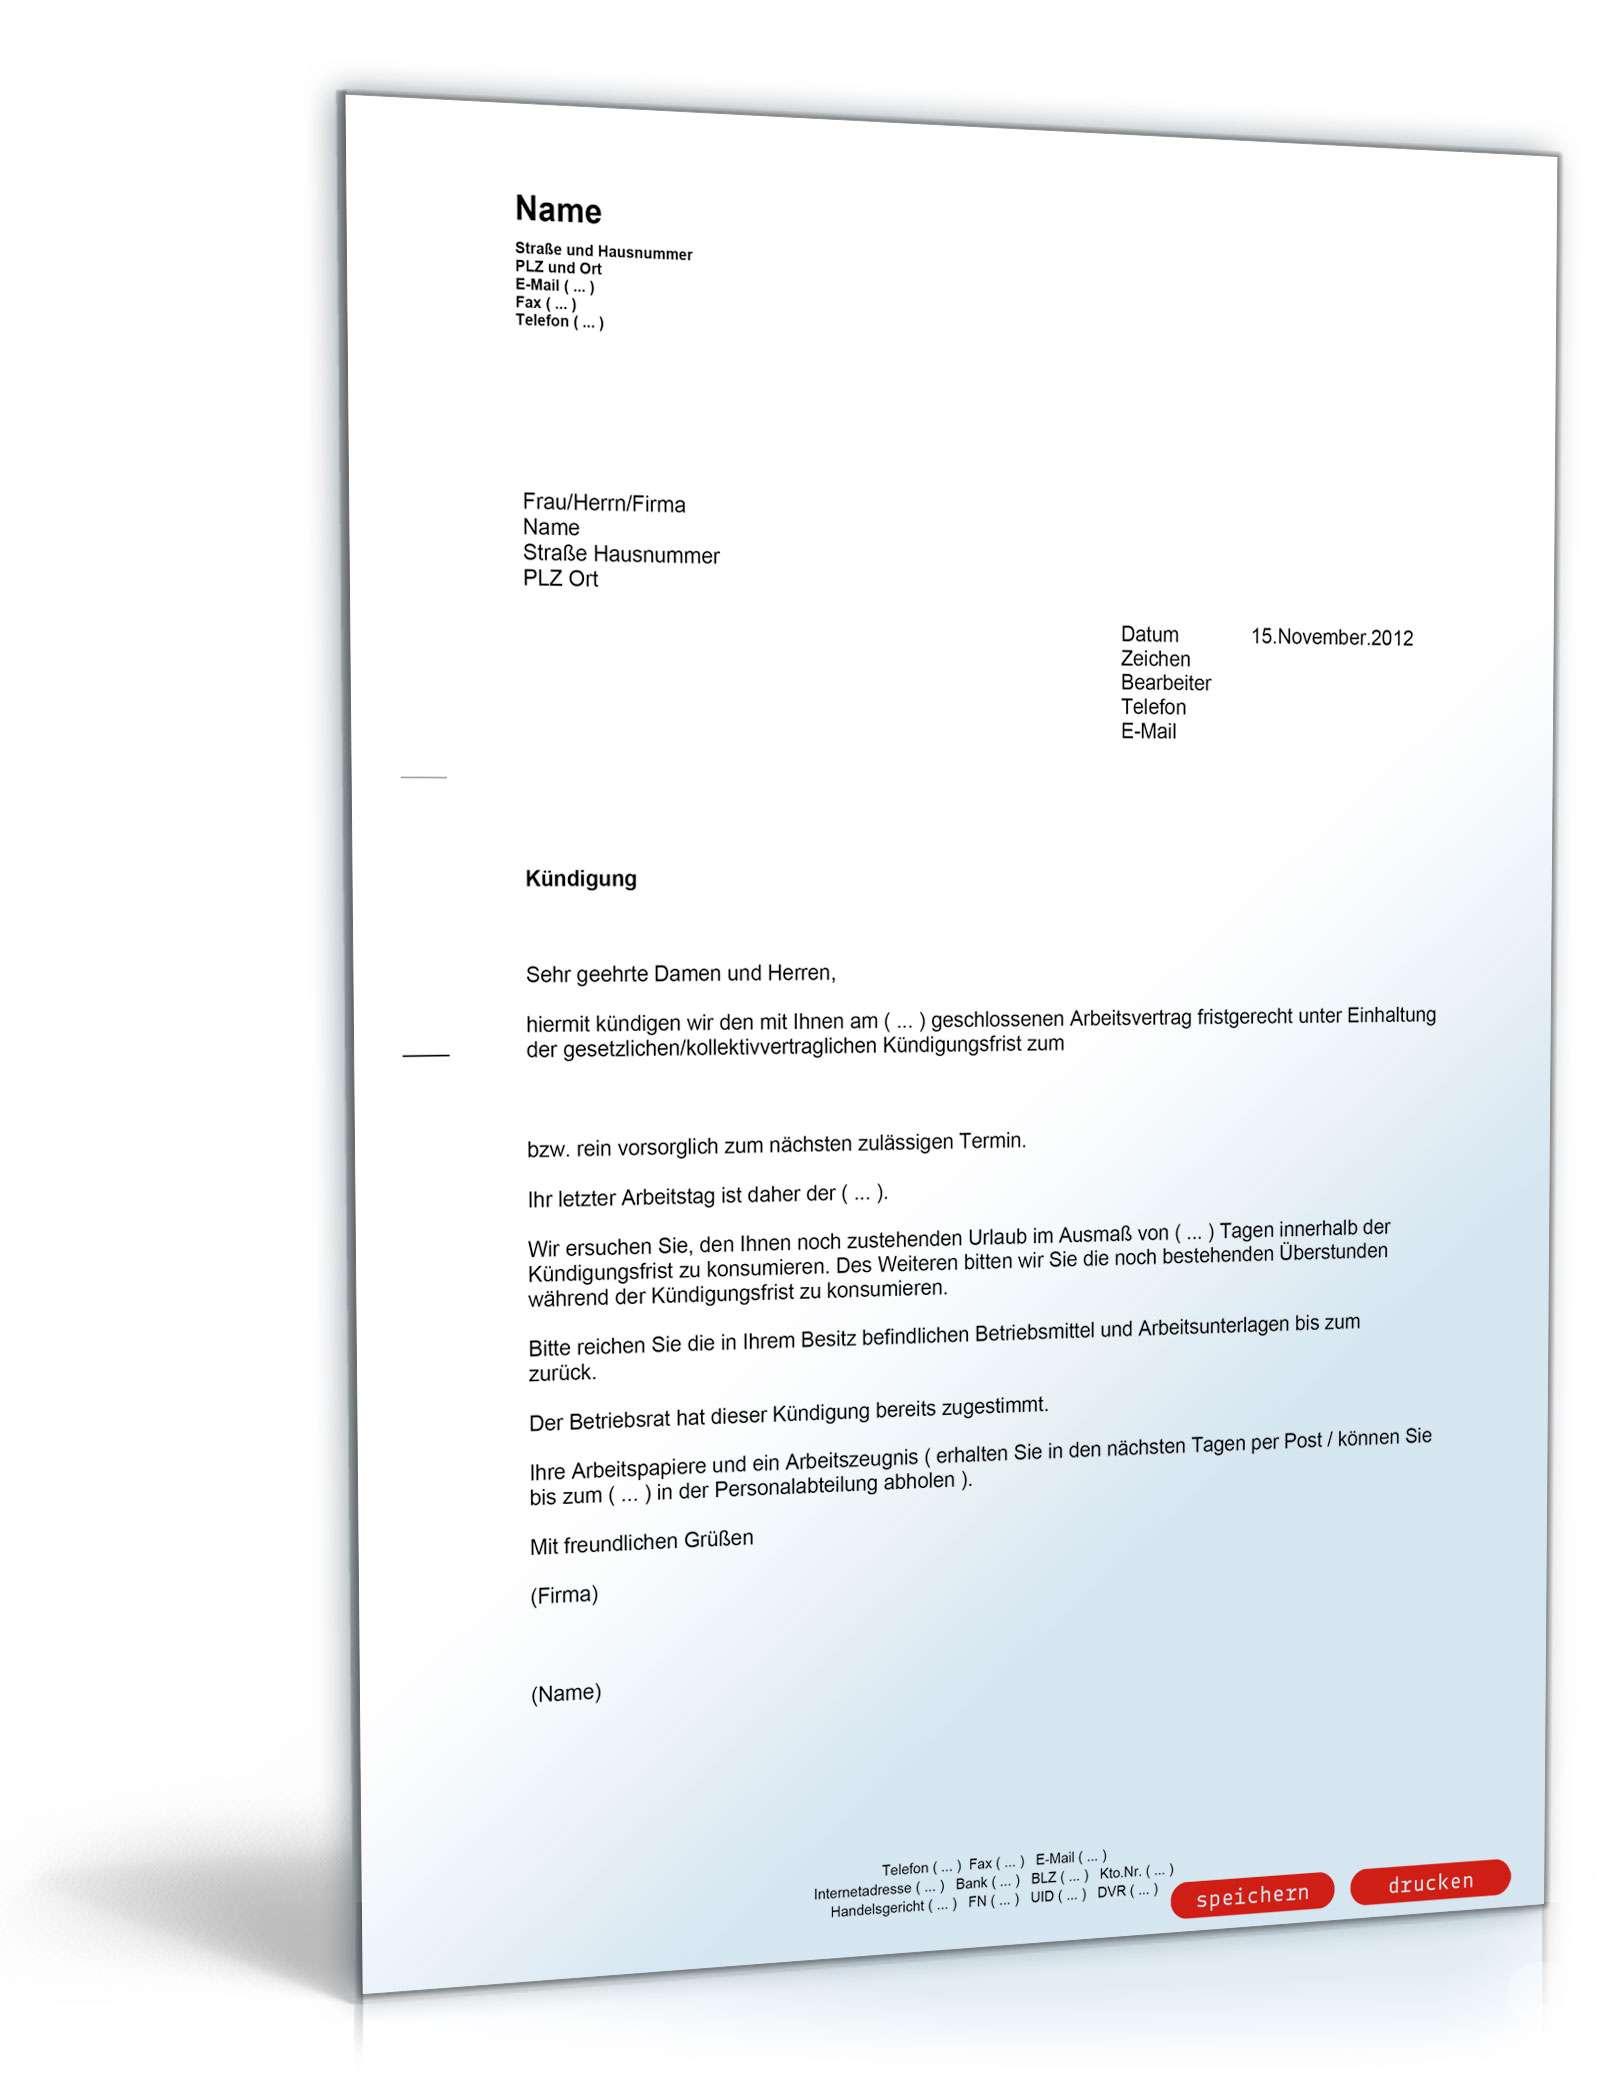 Kündigung Arbeitsvertrag (fristgemäß, Arbeitgeber) - Muster-Vorlage ...